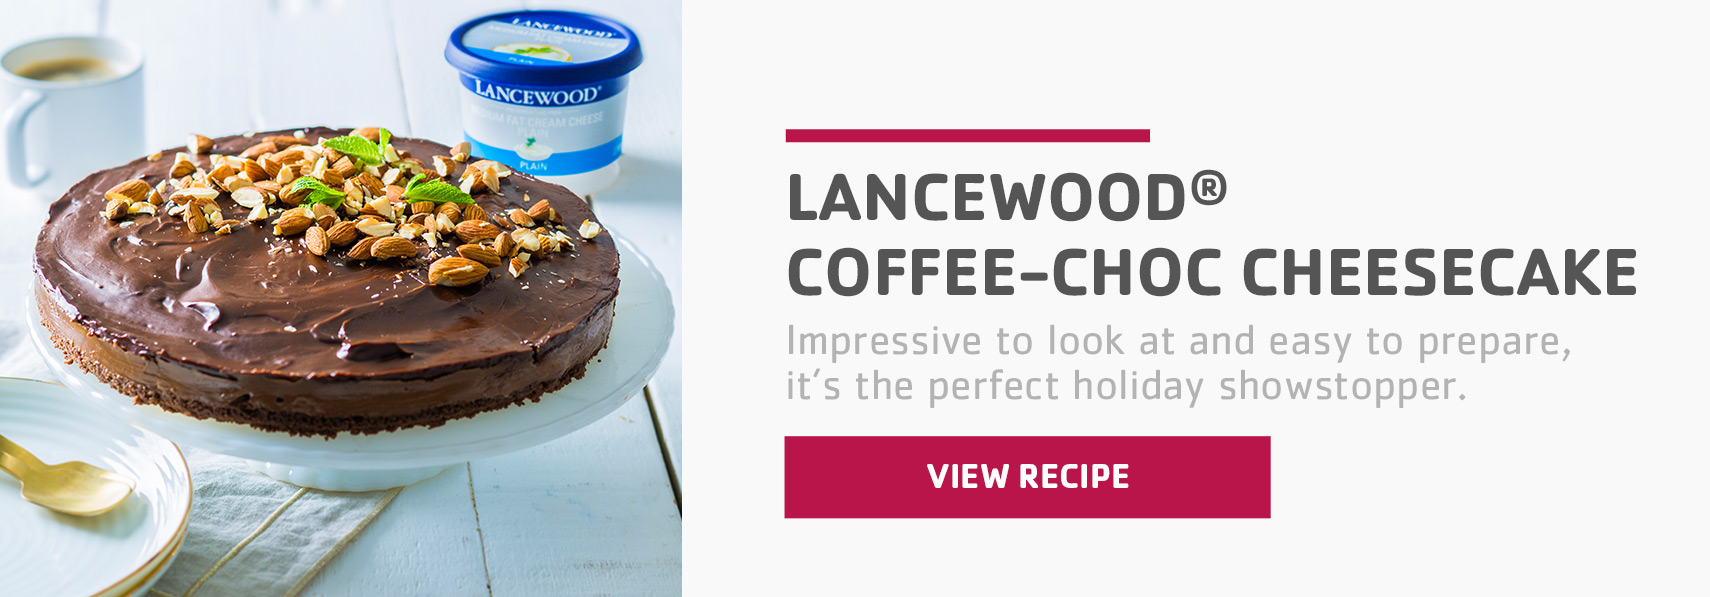 lancewood-cheescake.jpg